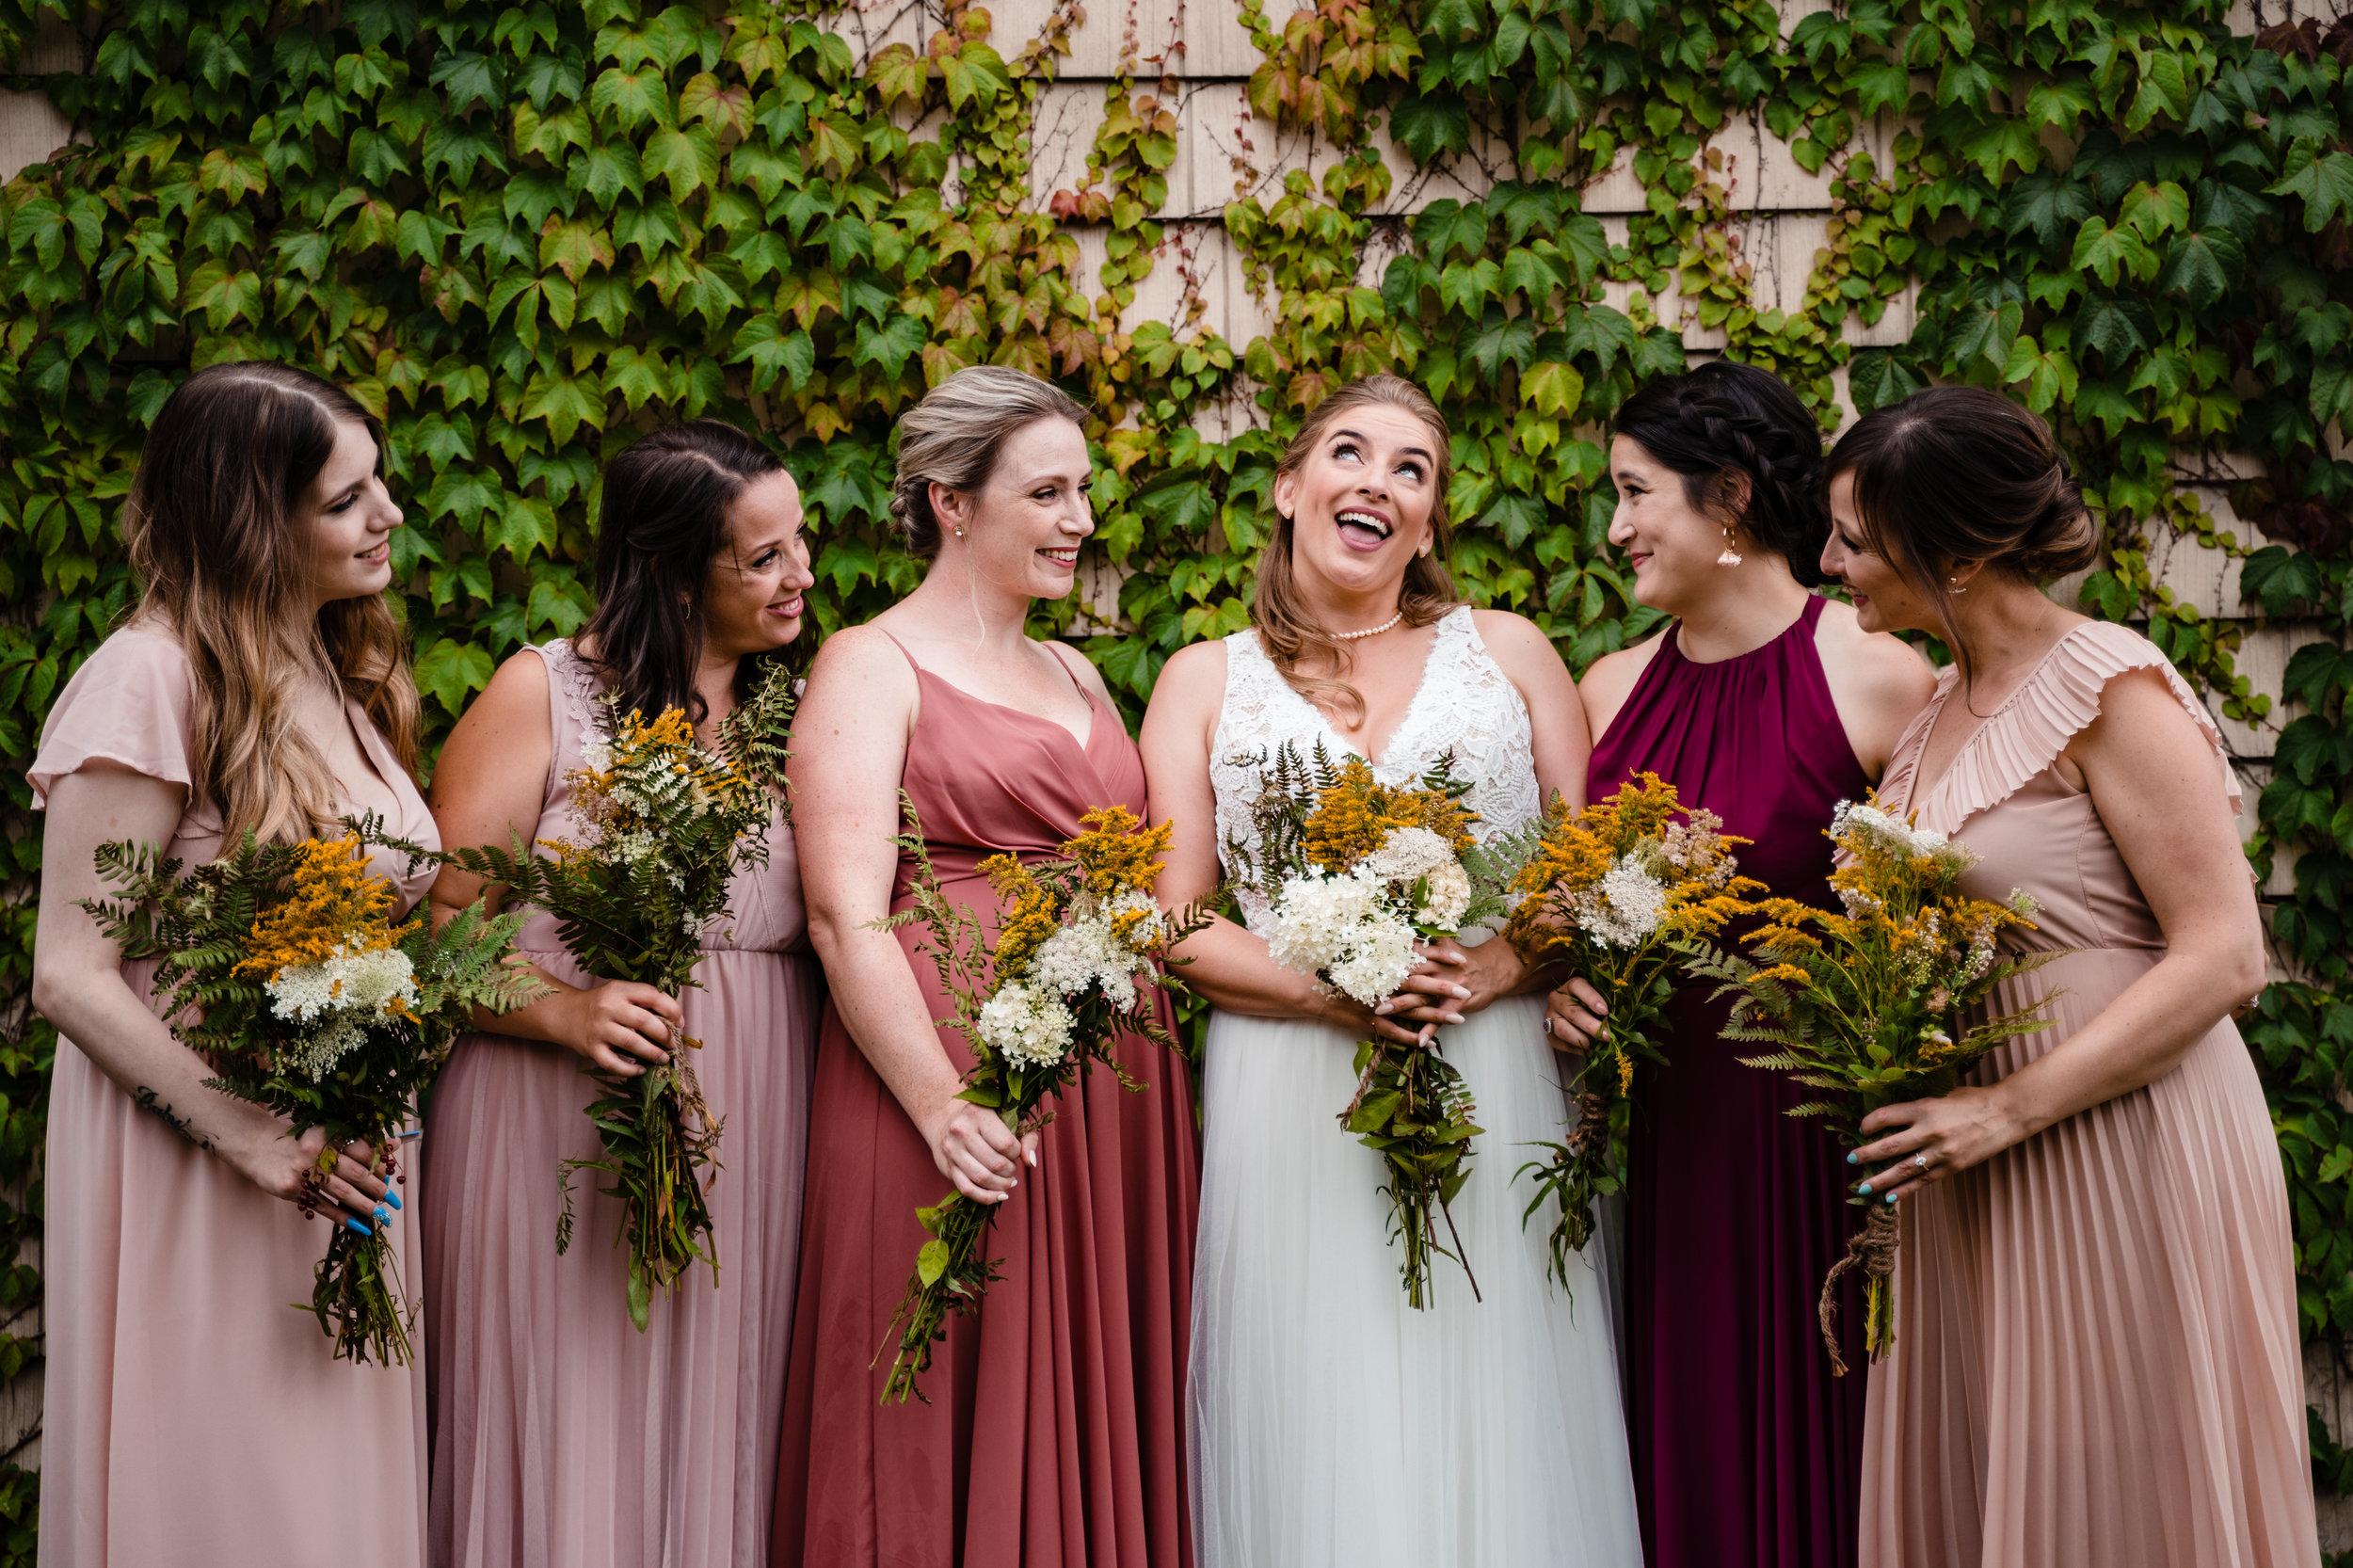 Janelle-Mitch-Halifax-Wedding-Nova-Scotia-Photography (61 of 163).jpg